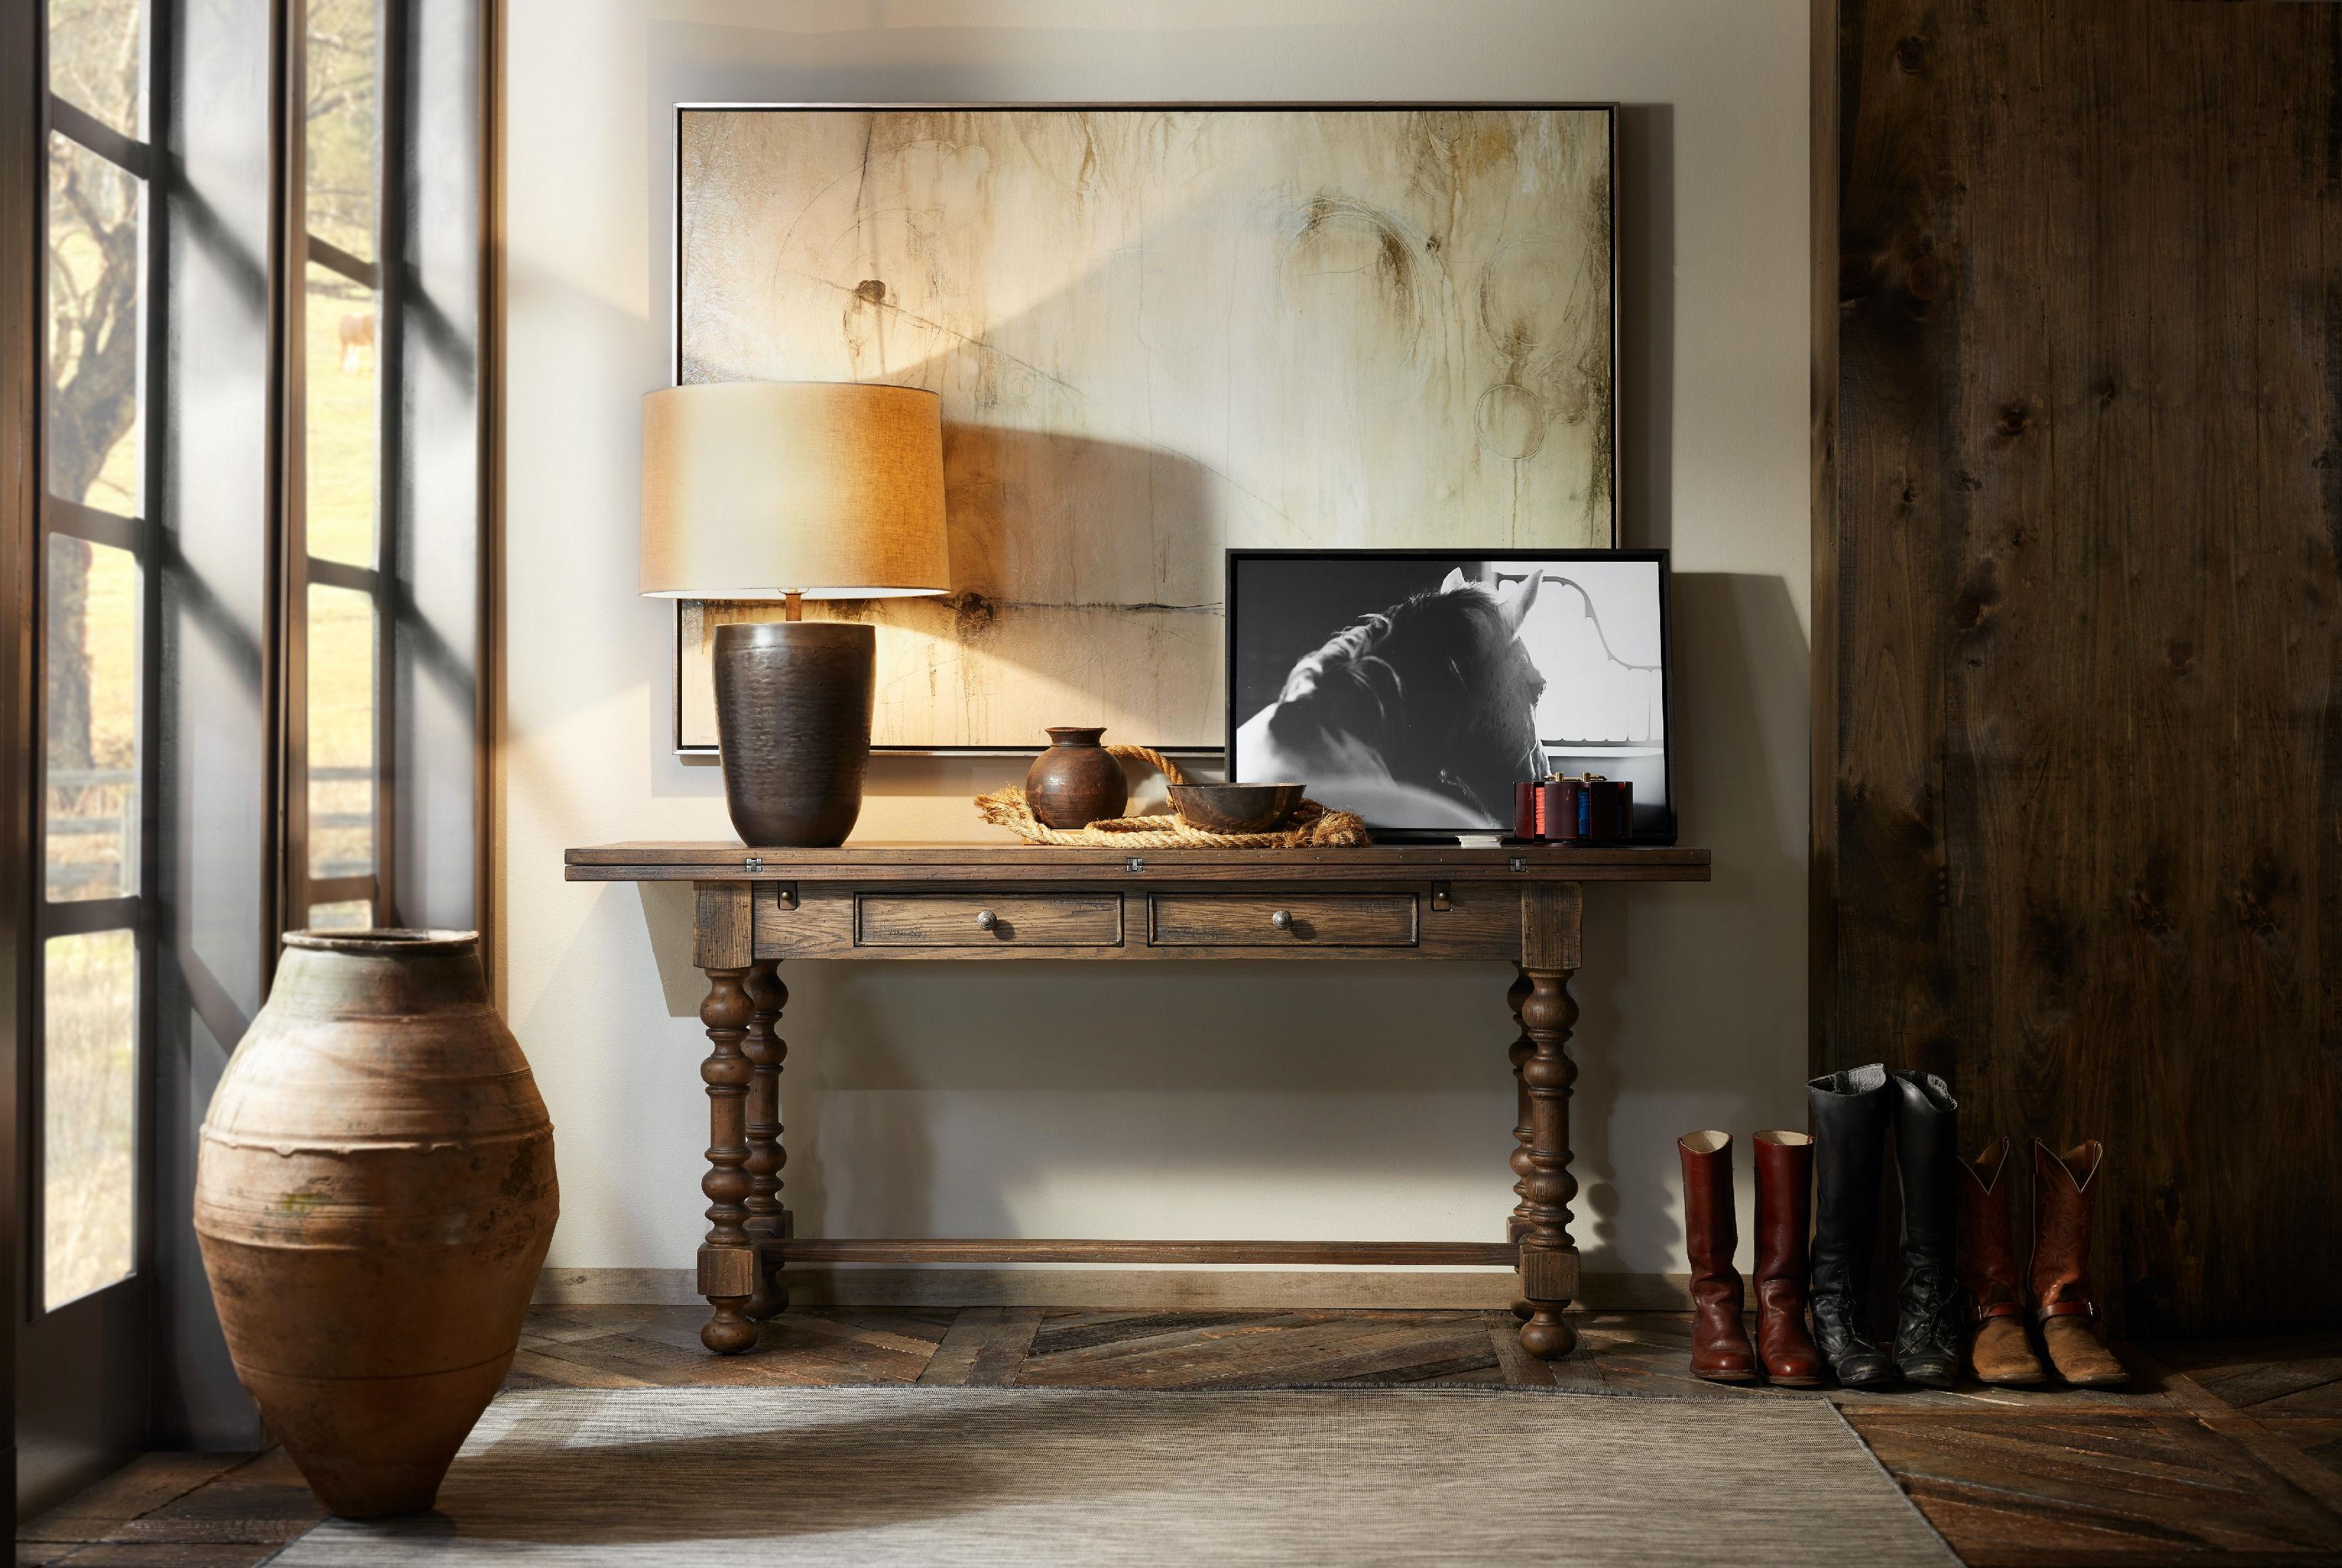 Hooker Furniture Bluewind Flip Top Console Table 5960 85001 BRN